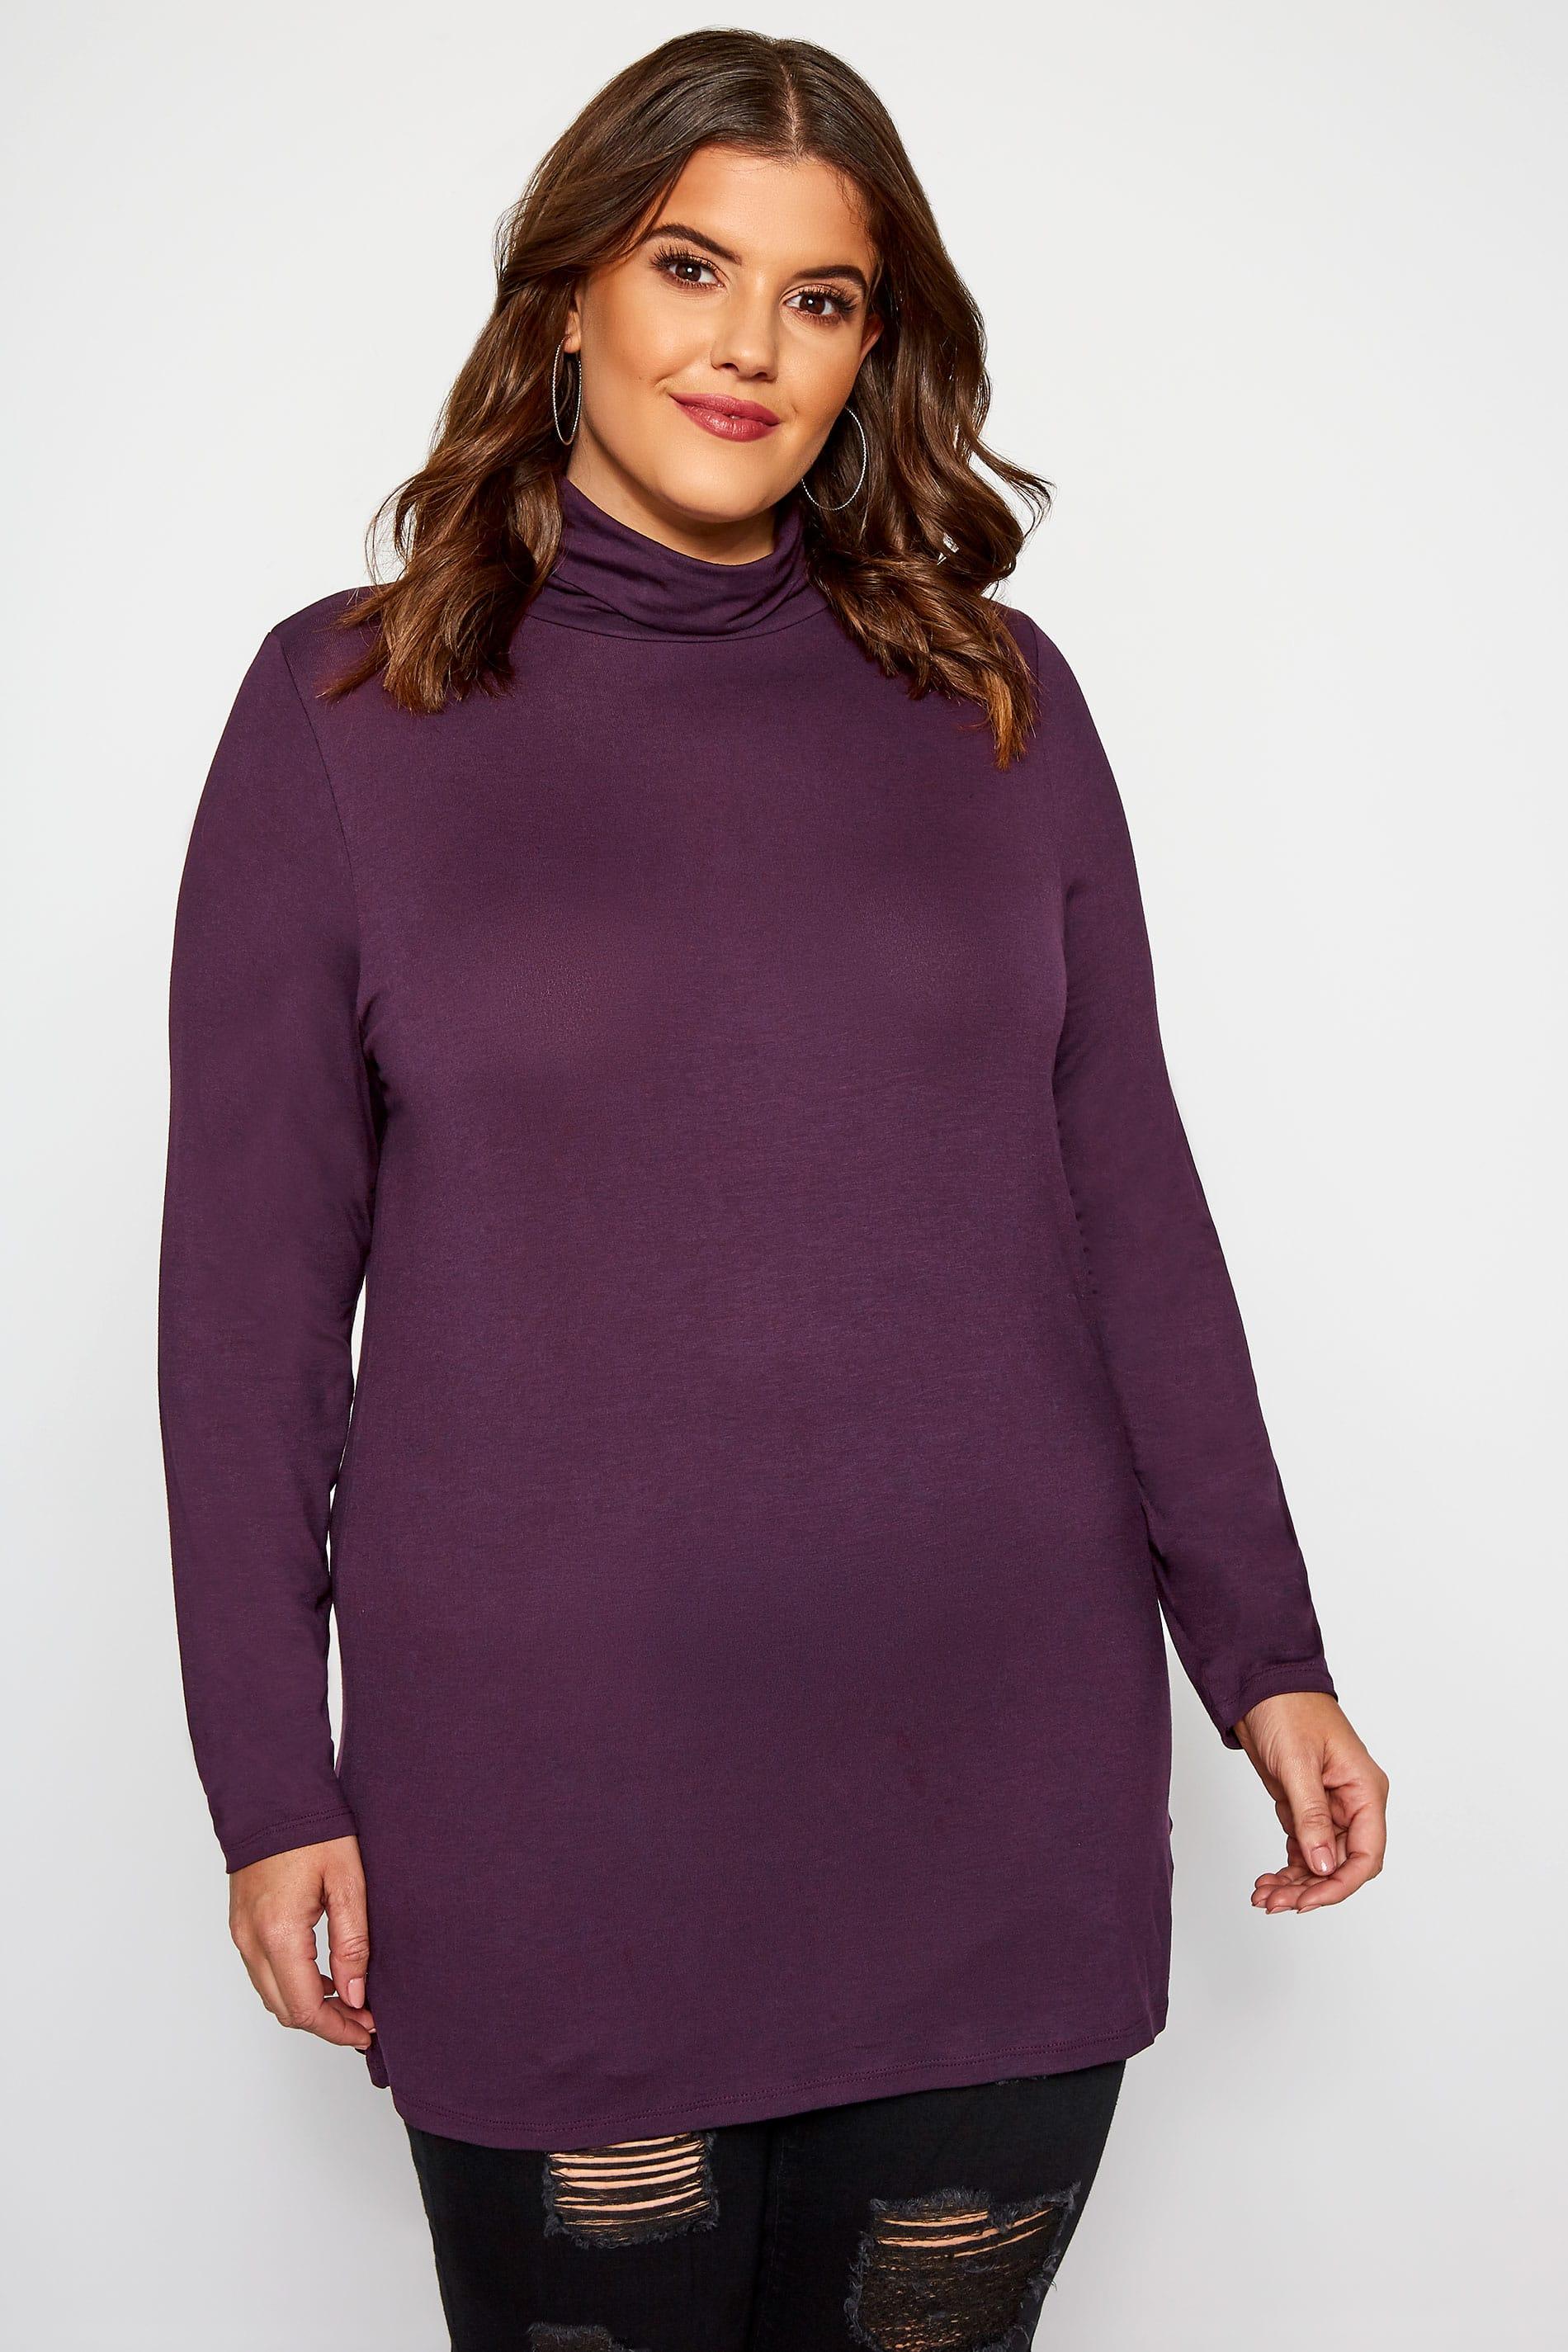 Purple Turtleneck Top